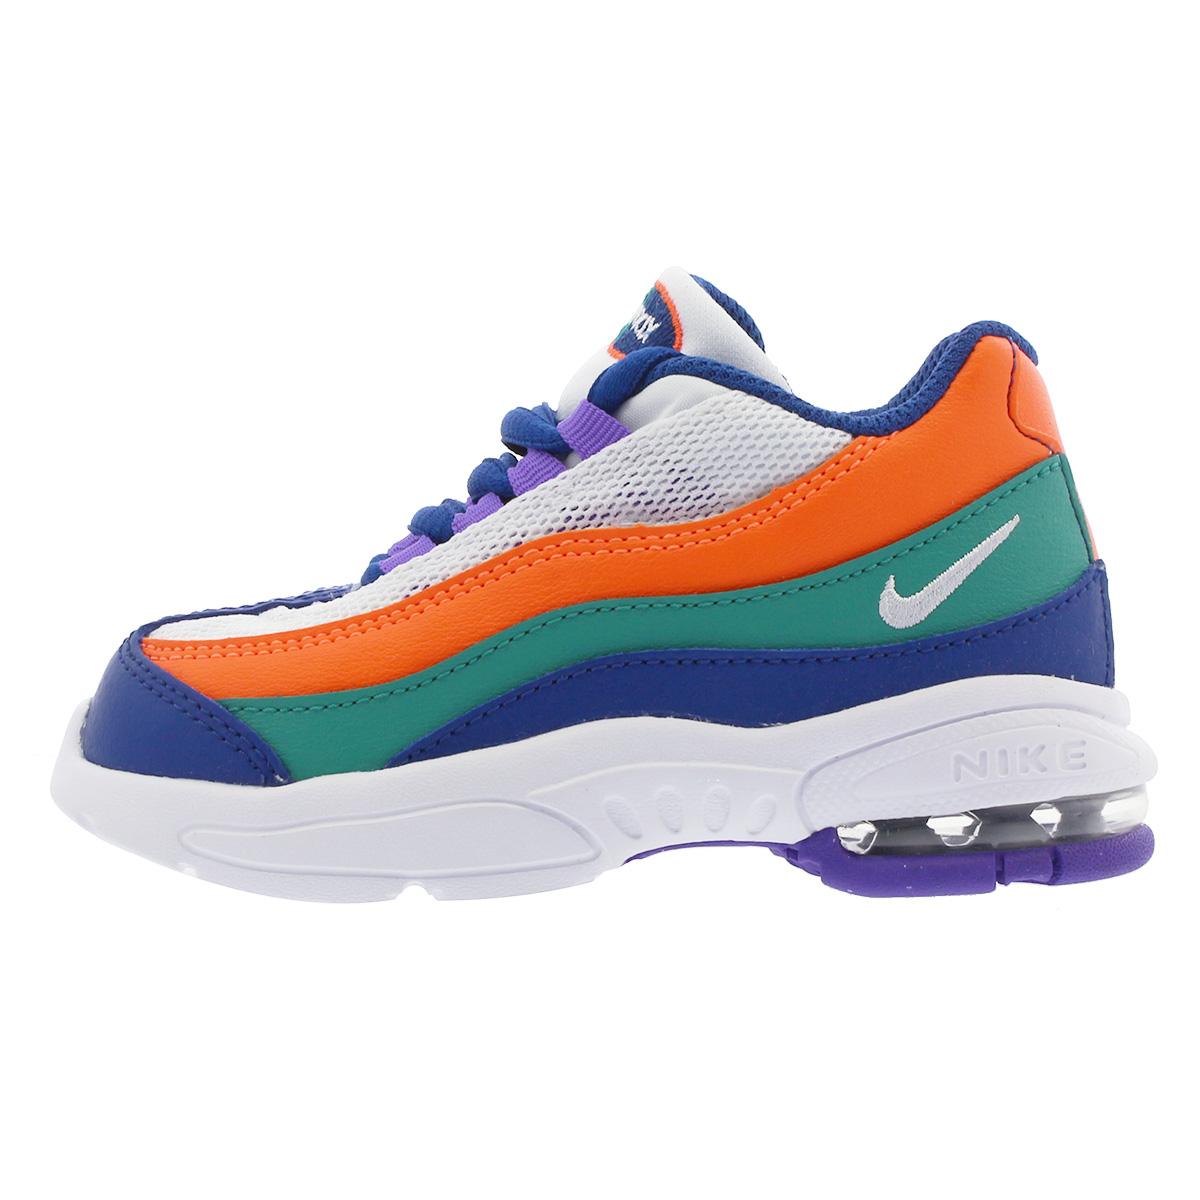 sports shoes 00f28 048d7 NIKE AIR MAX 95 TD Kie Ney AMAX 95 TD WHITE/BLUE/ORANGE/GREEN 905,462-412